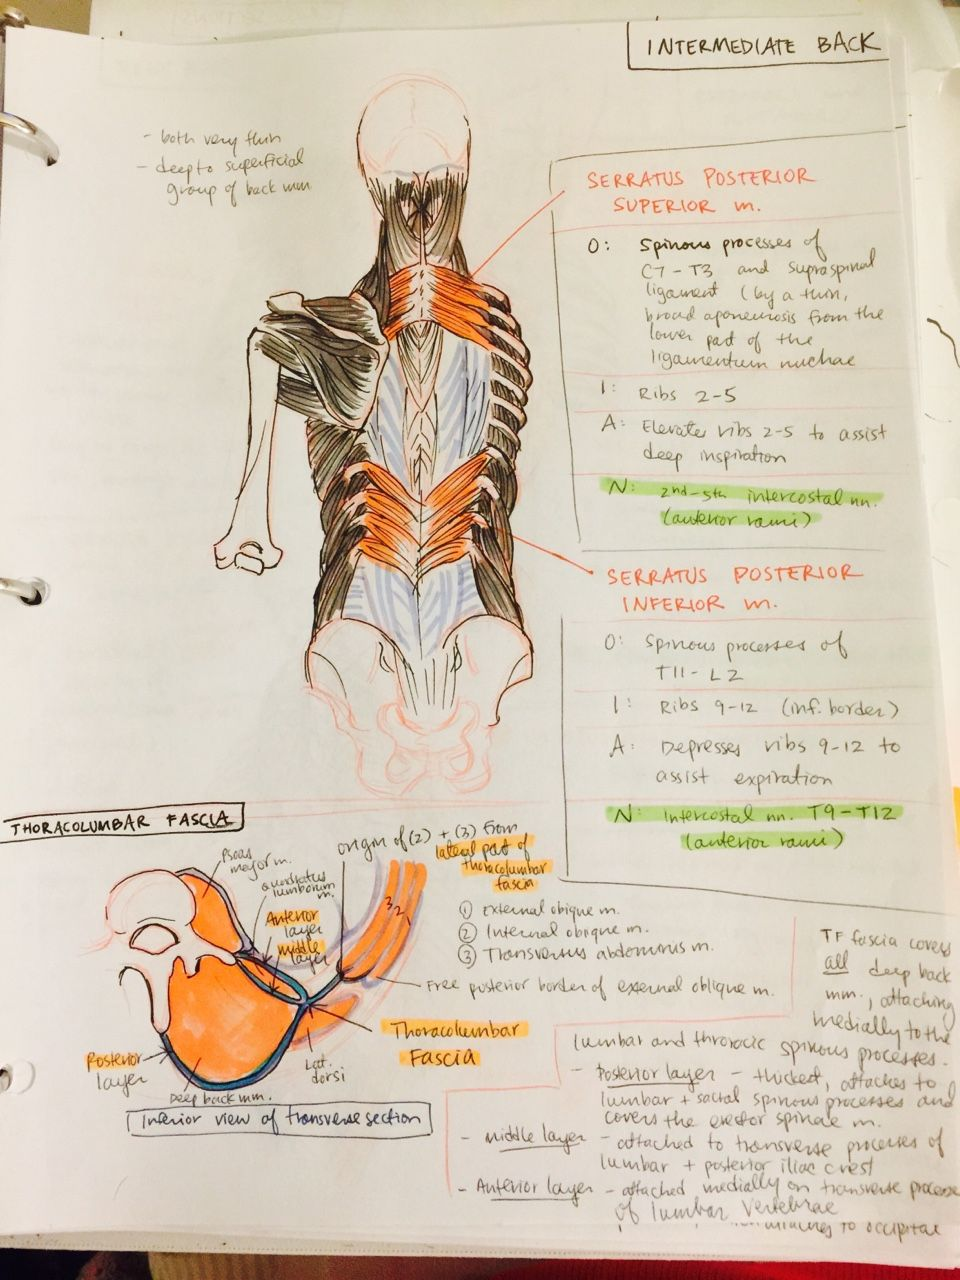 ambitions like ribbons   Anatomia   Pinterest   Apuntes, Anatomía y ...